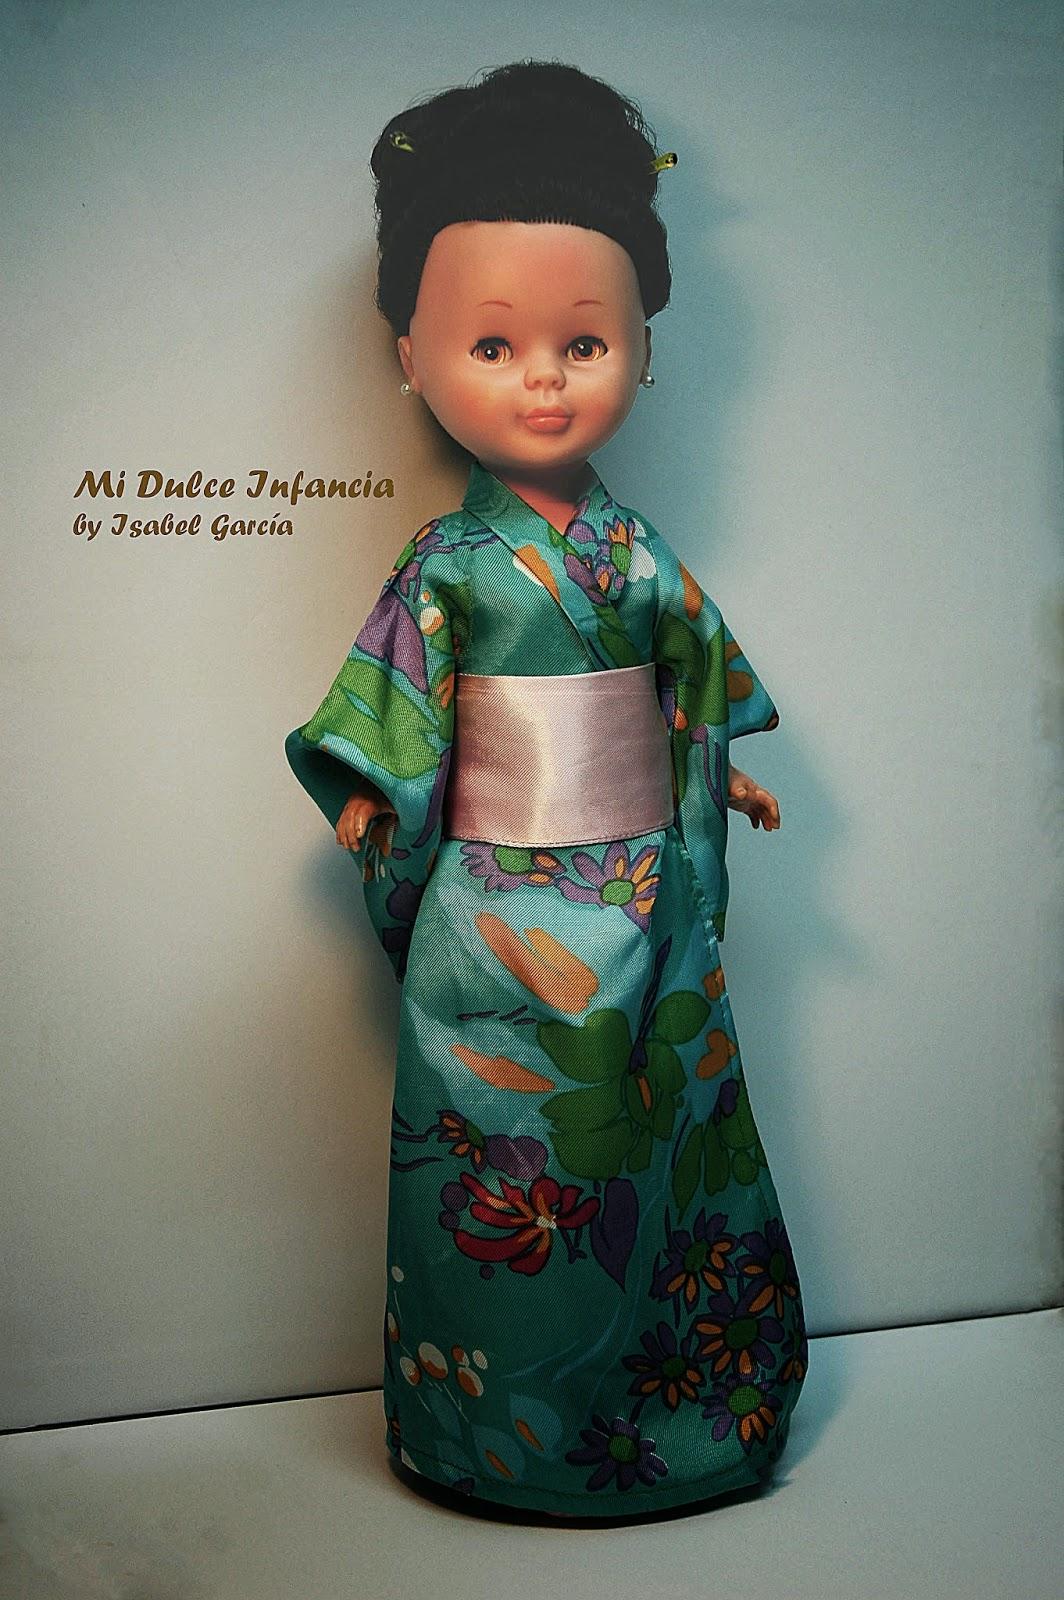 http://volviendoaladulceinfancia.blogspot.com.es/2014/01/mi-nancy-gheisa.html